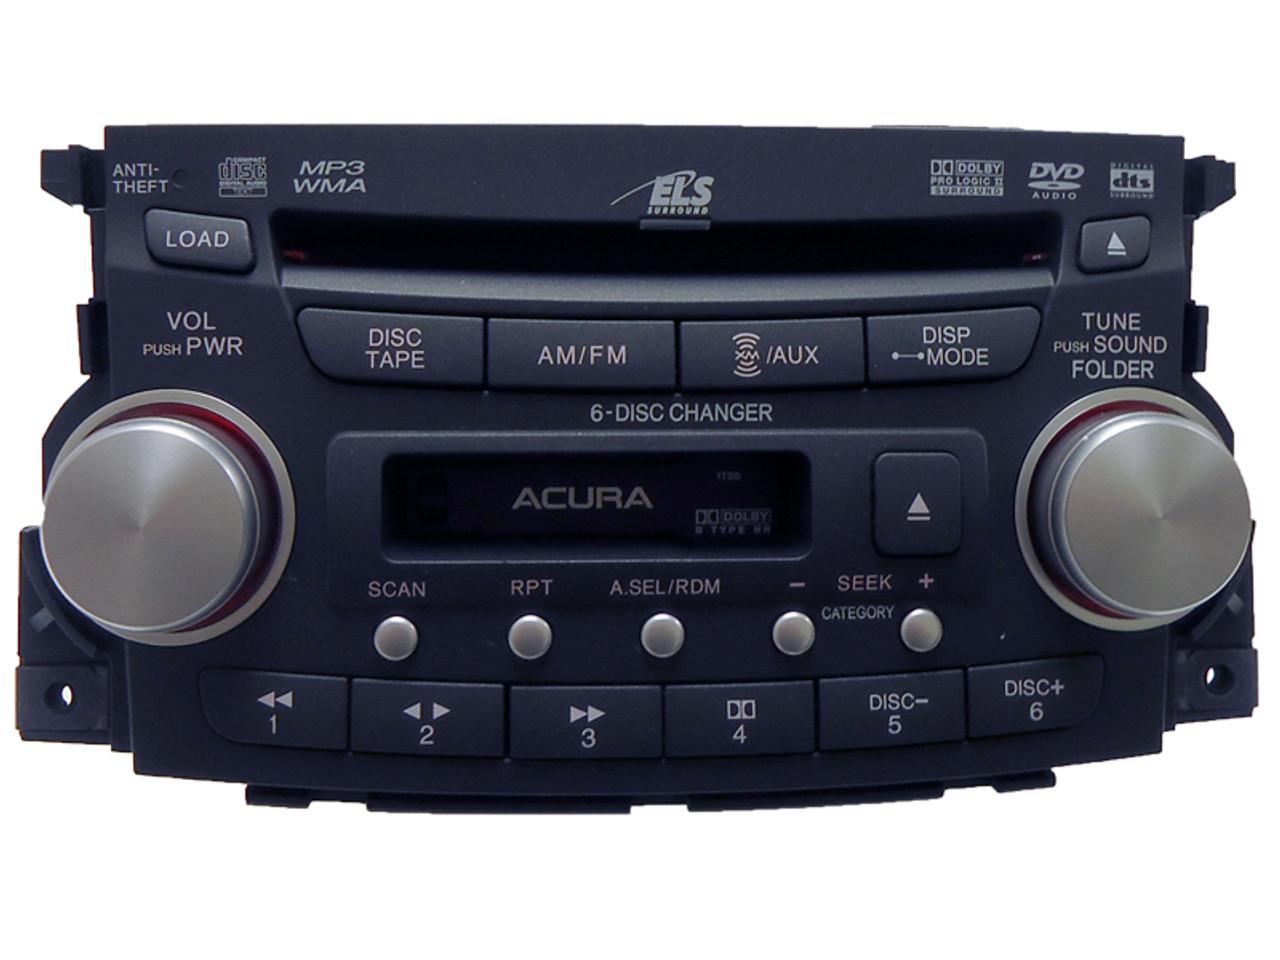 2007 2008 Acura Tl Xm Navigation Stereo 6 Cd Mp3 Tape Playerrhcd4car: 2007 Acura Xm Radio At Gmaili.net